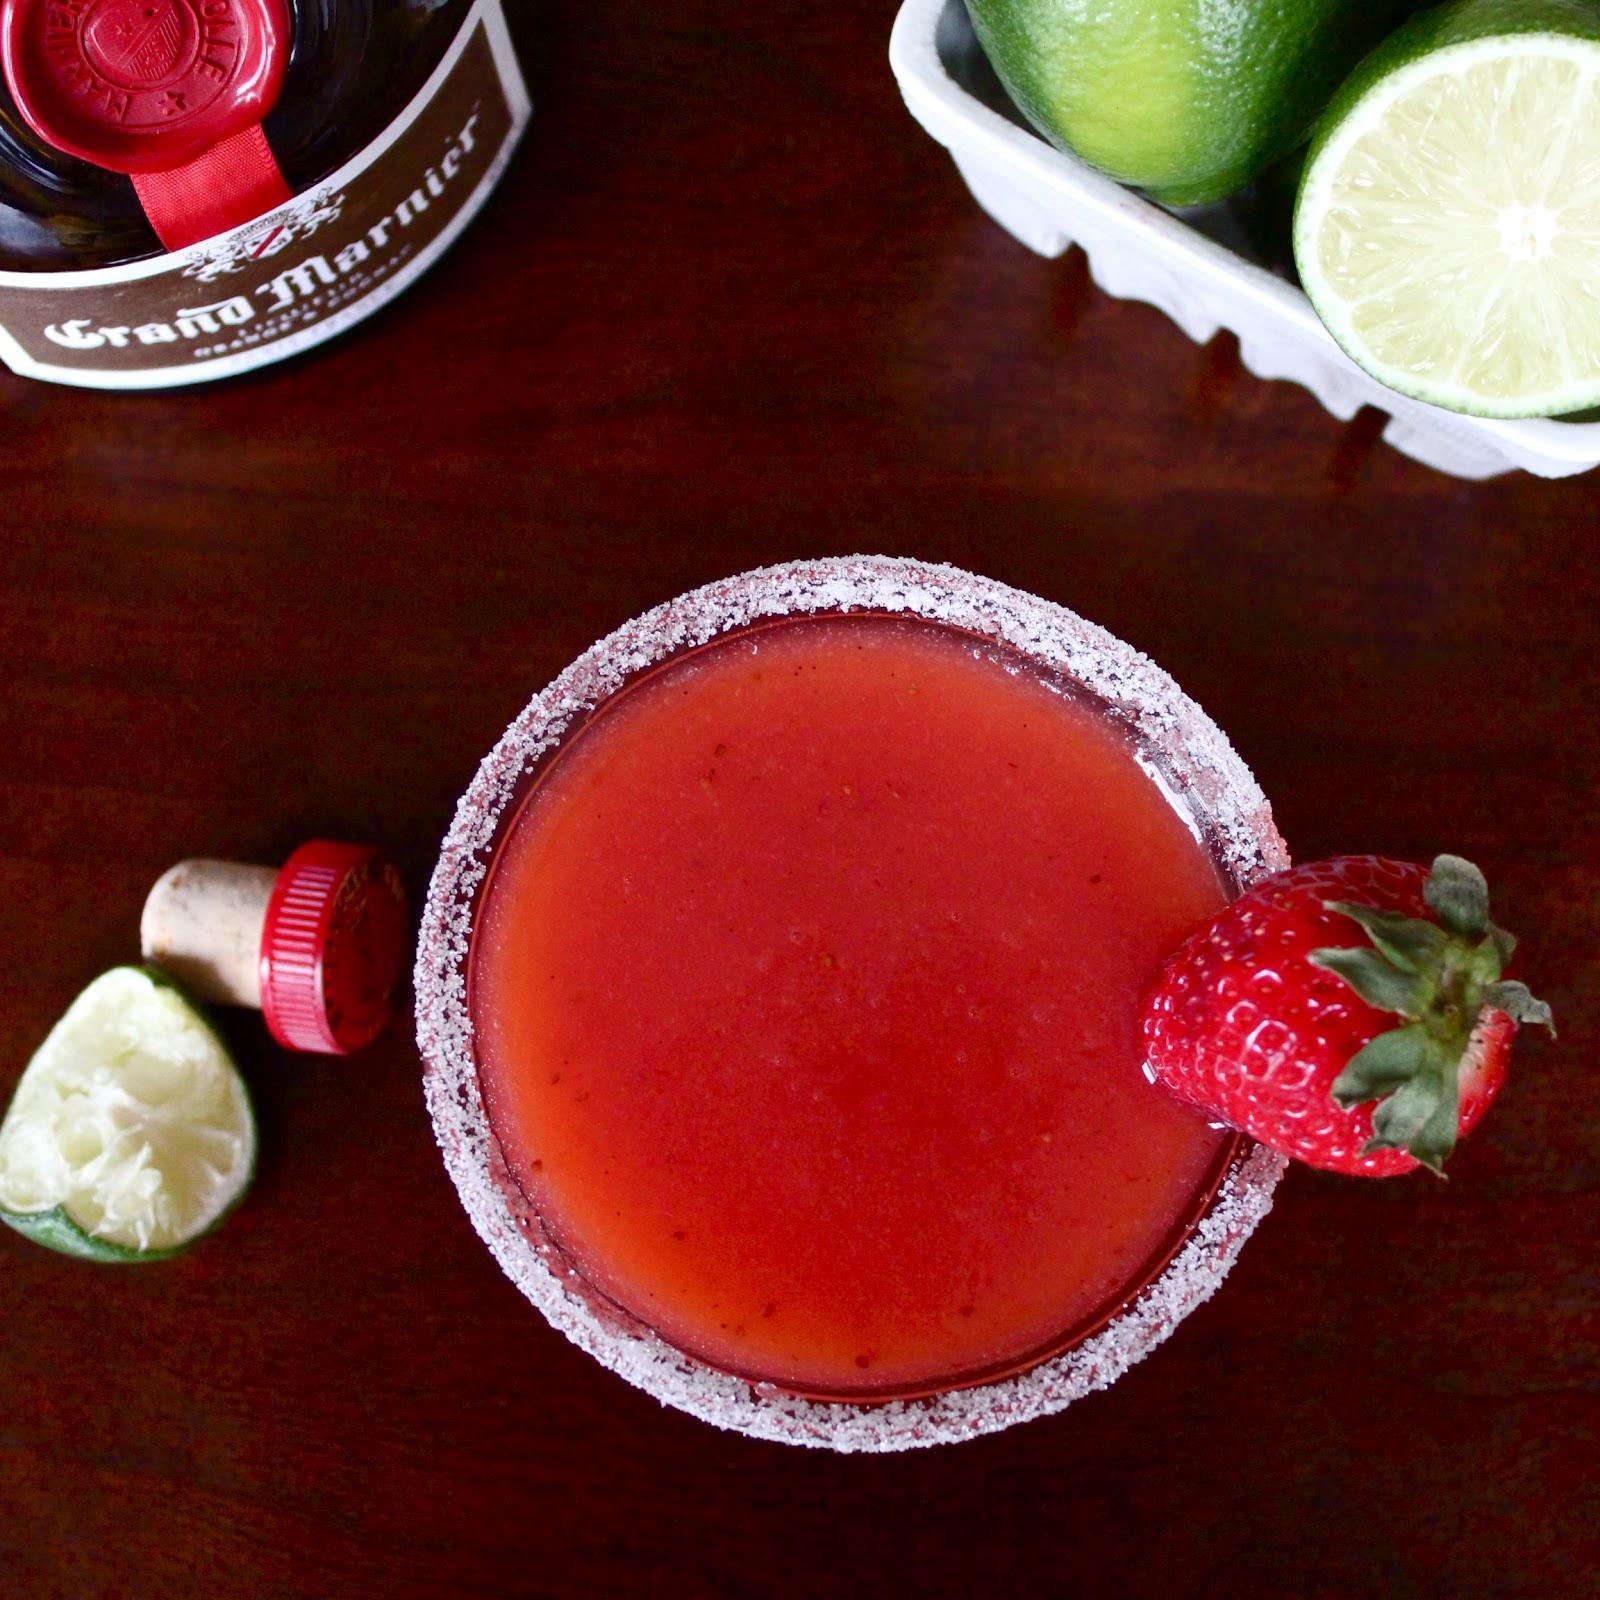 Butrcreamblondi: Strawberry Rhubarbarita